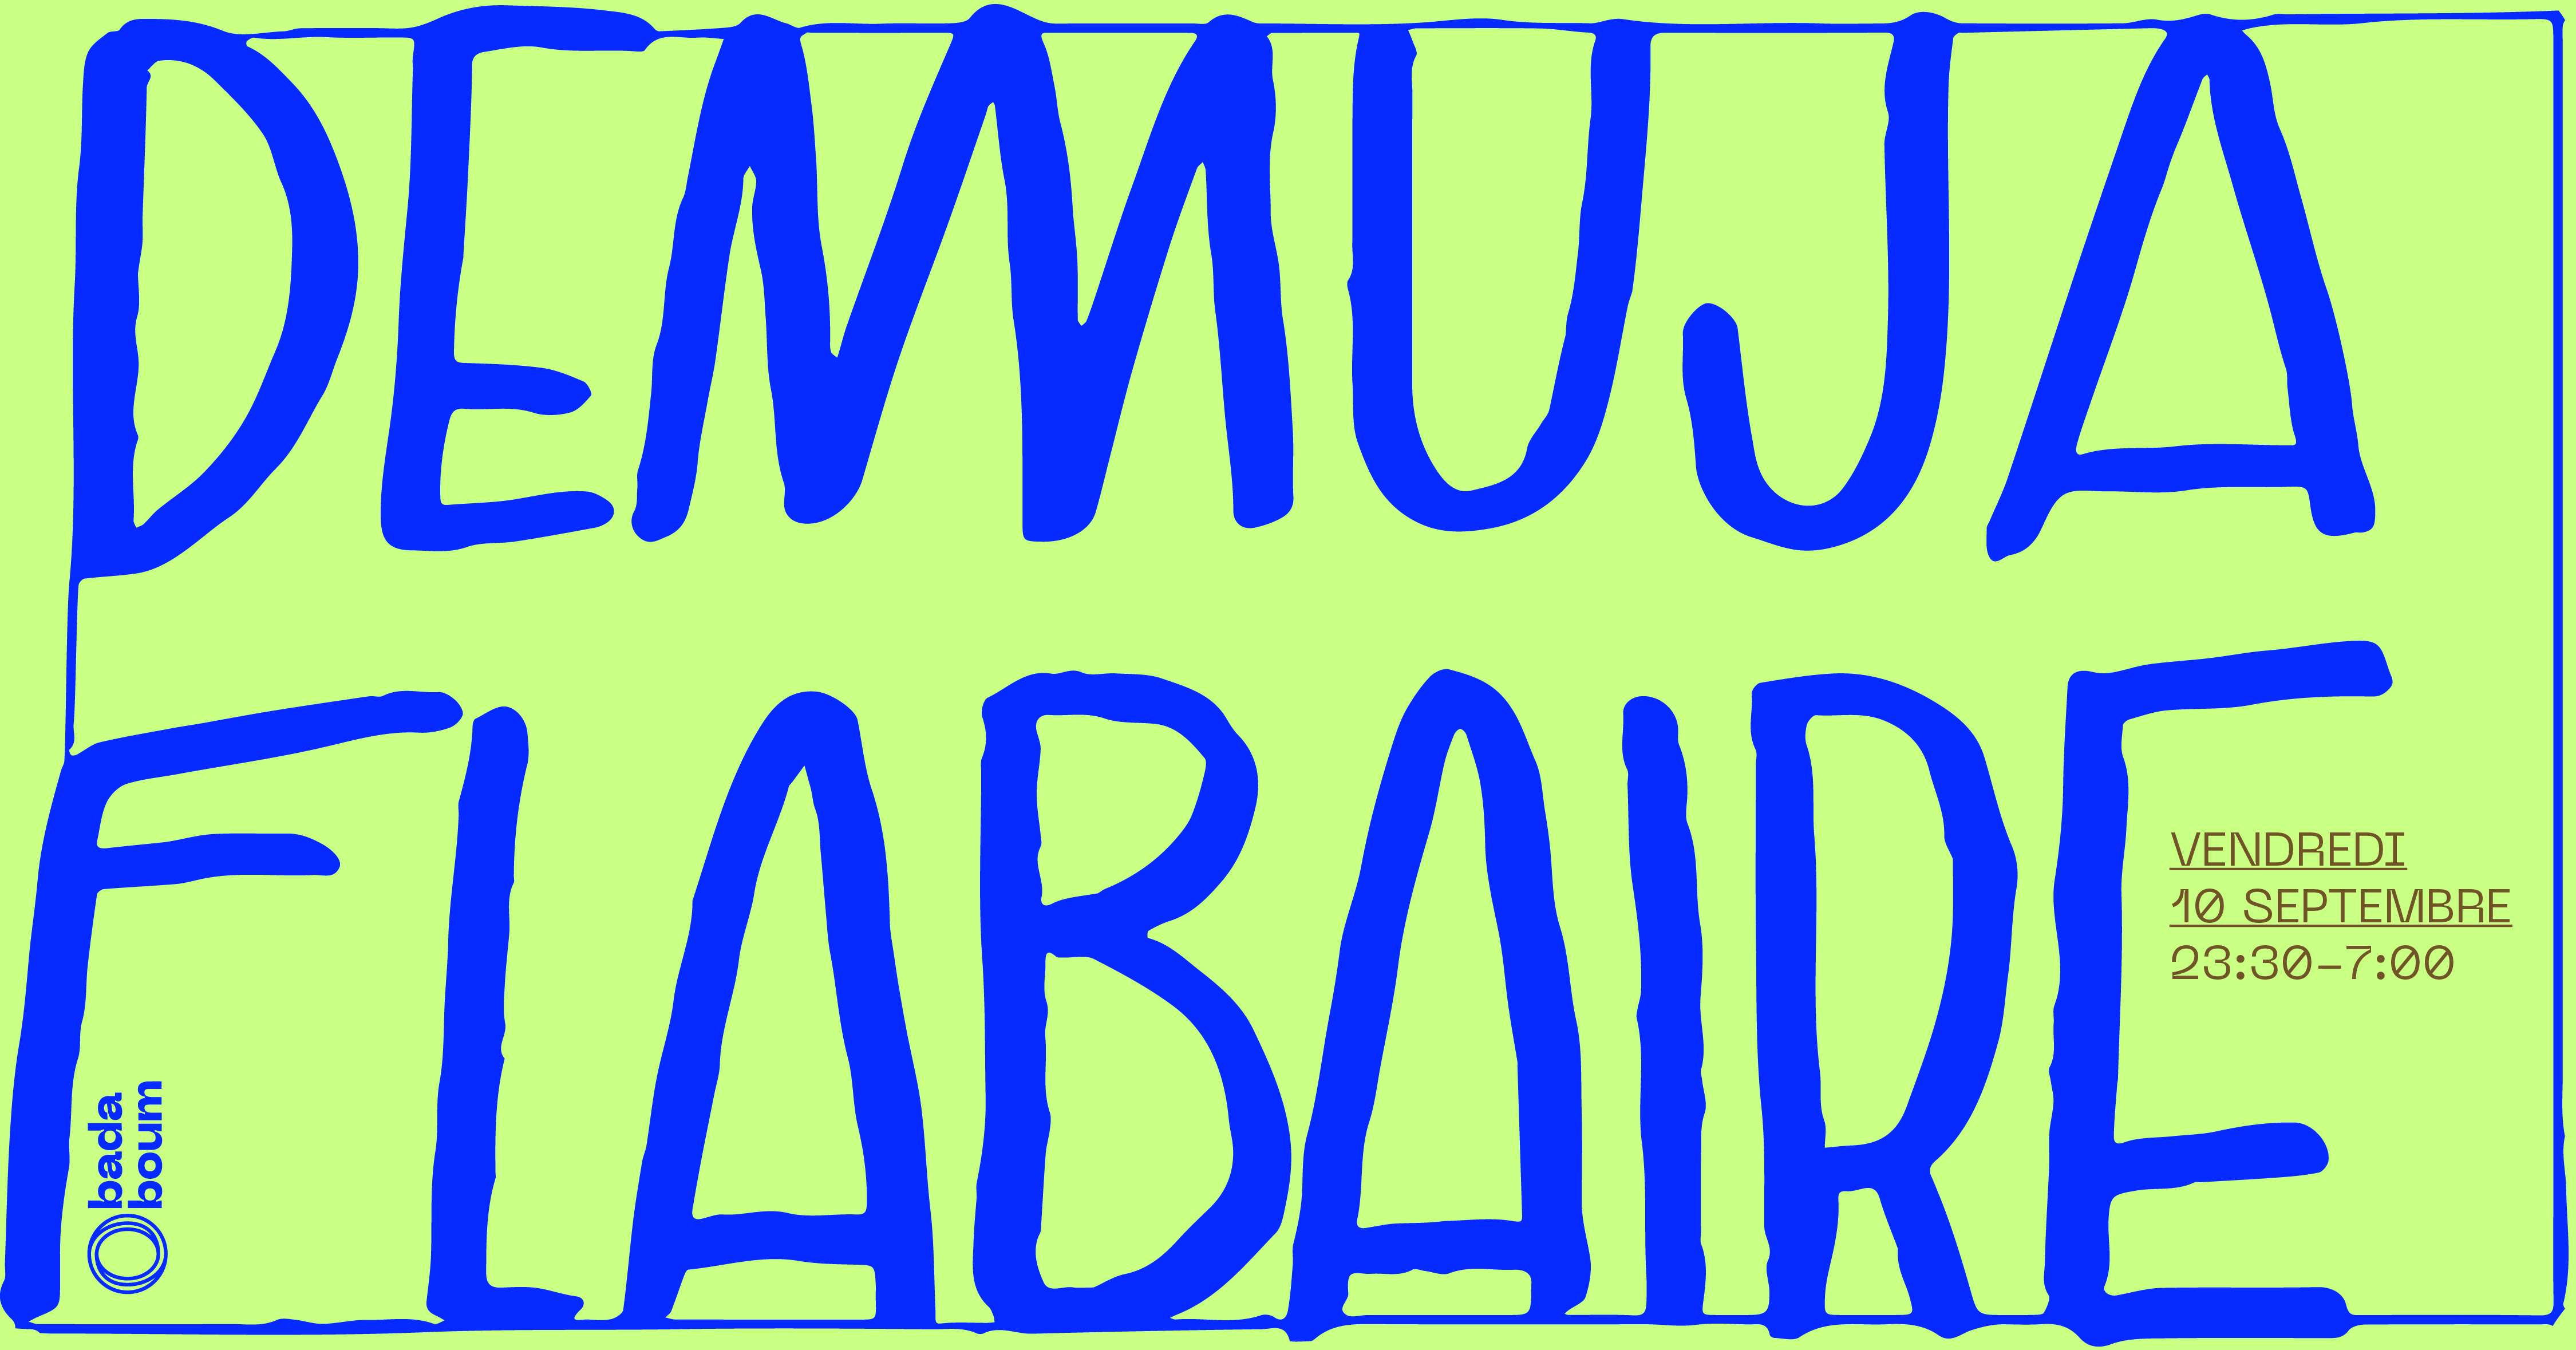 Badaboum Club : Demuja (extended set), Flabaire